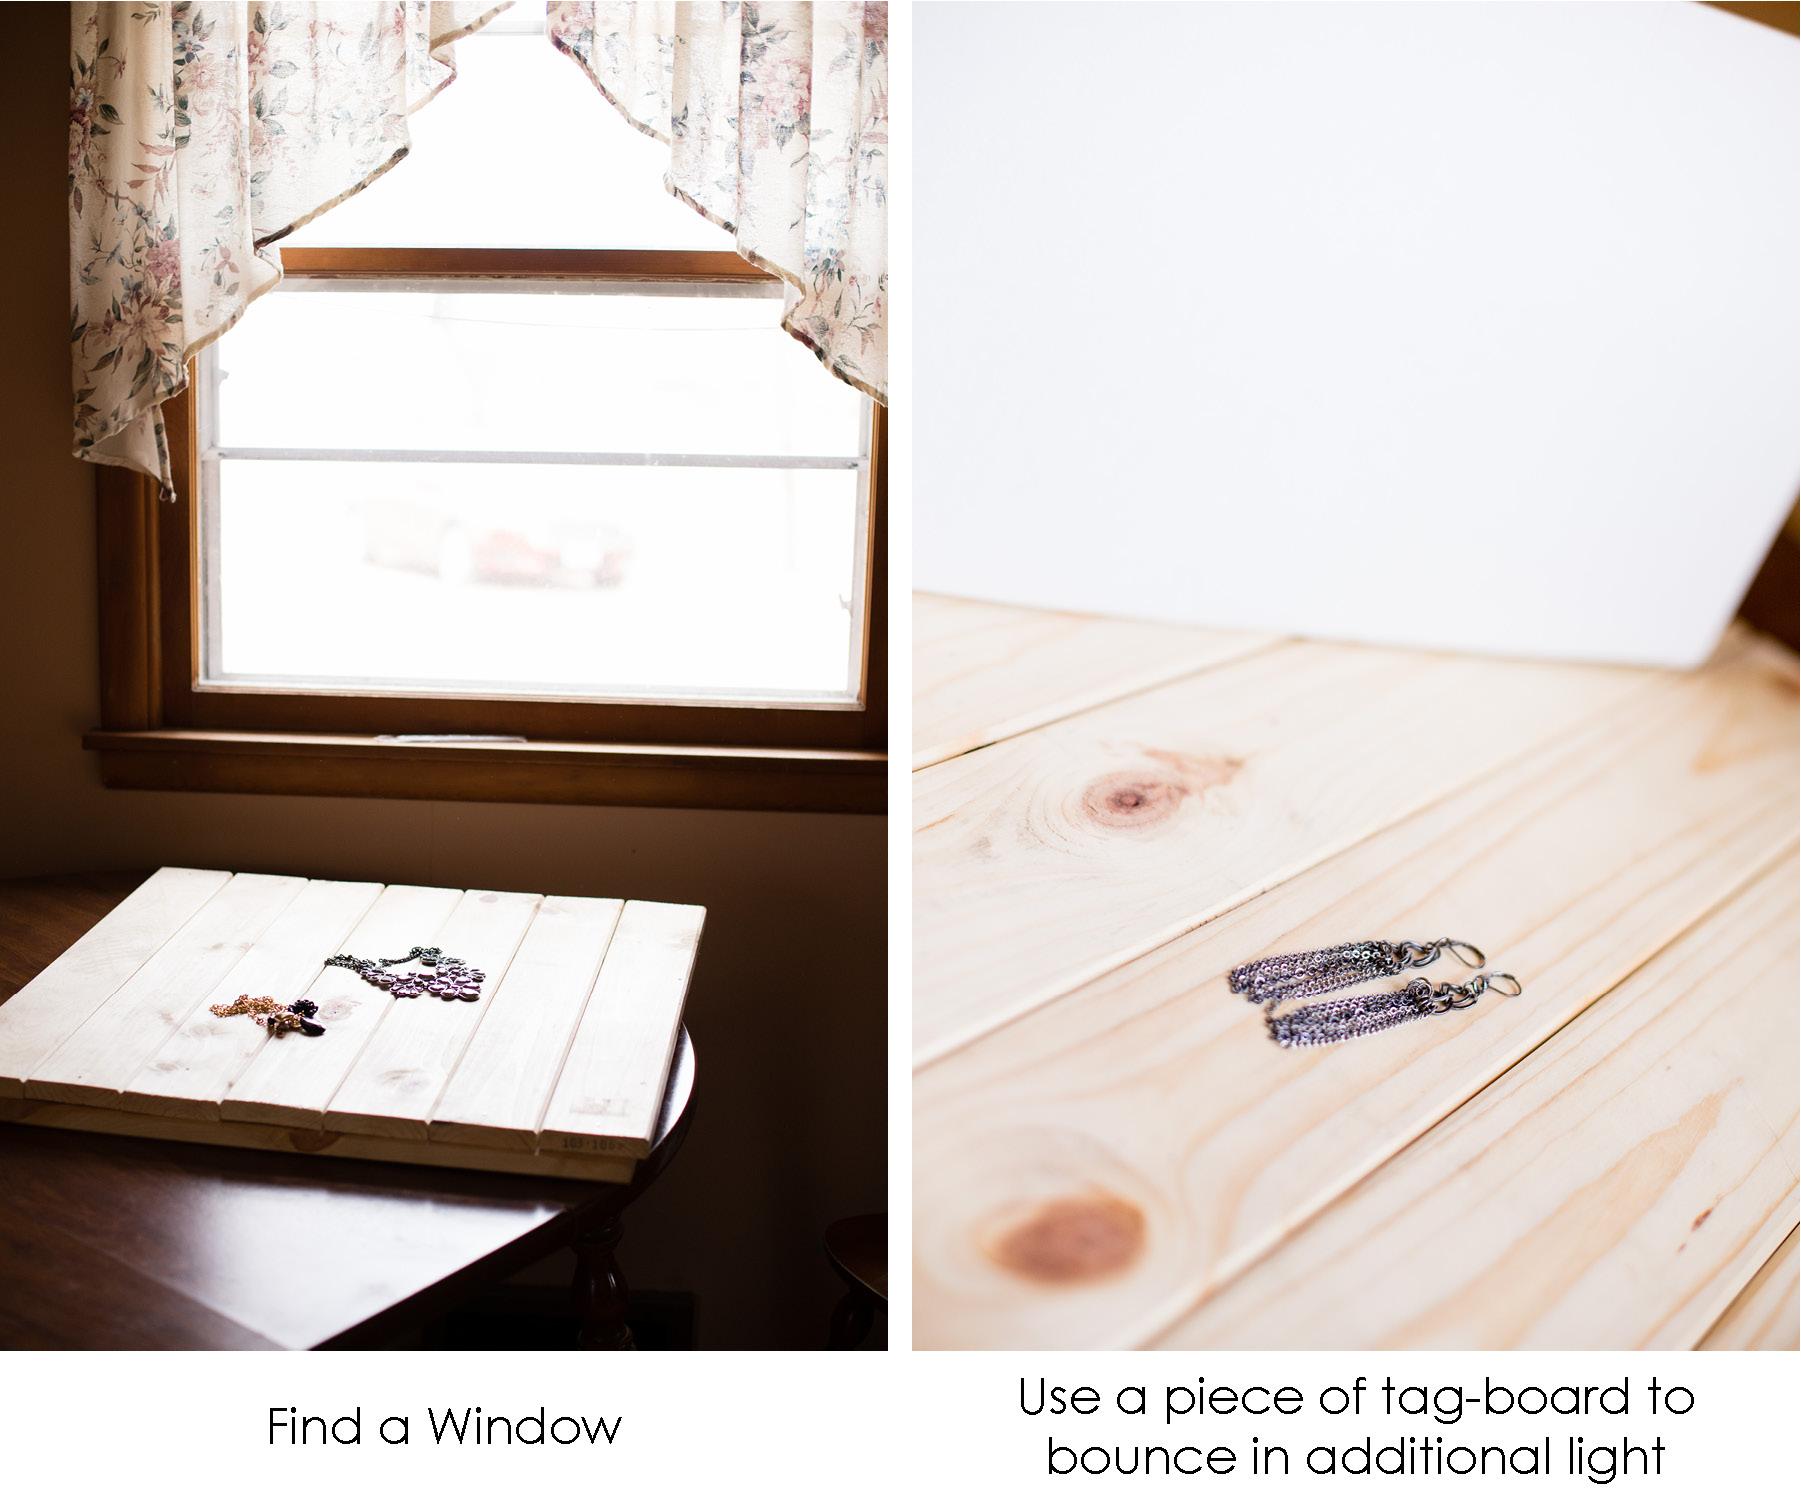 Window Light Product Photography